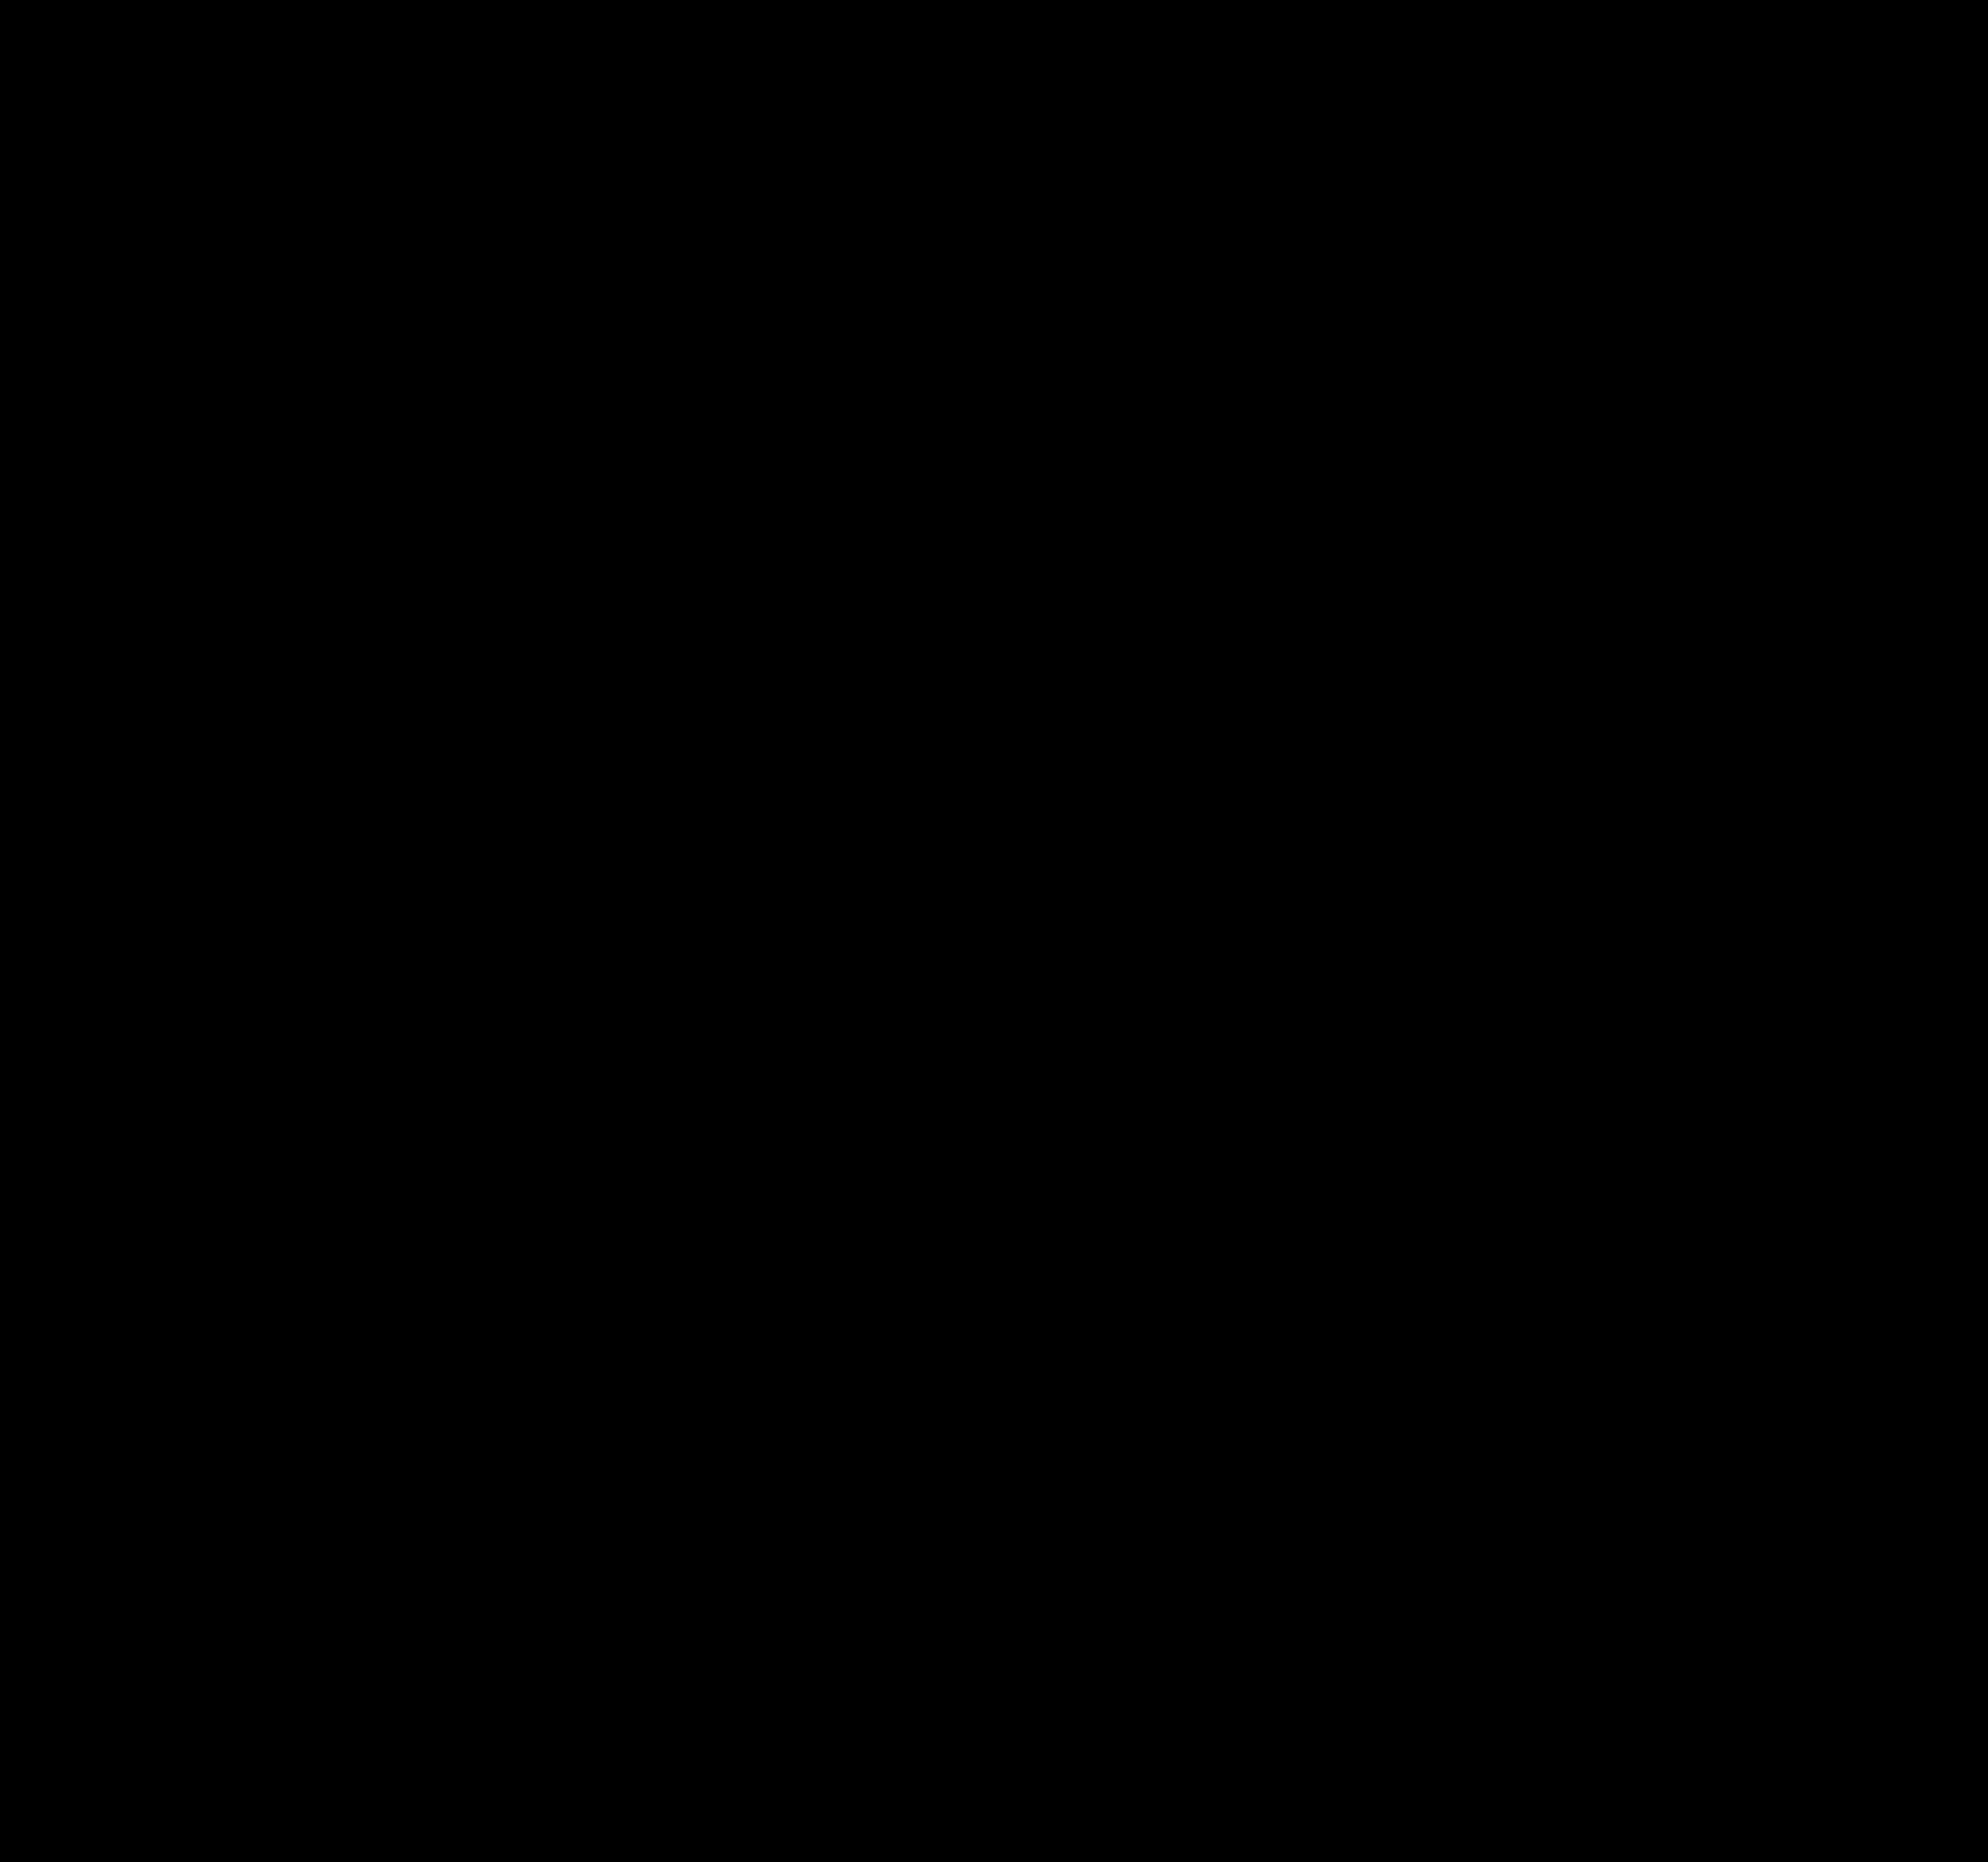 Paw PNG HD - 145695